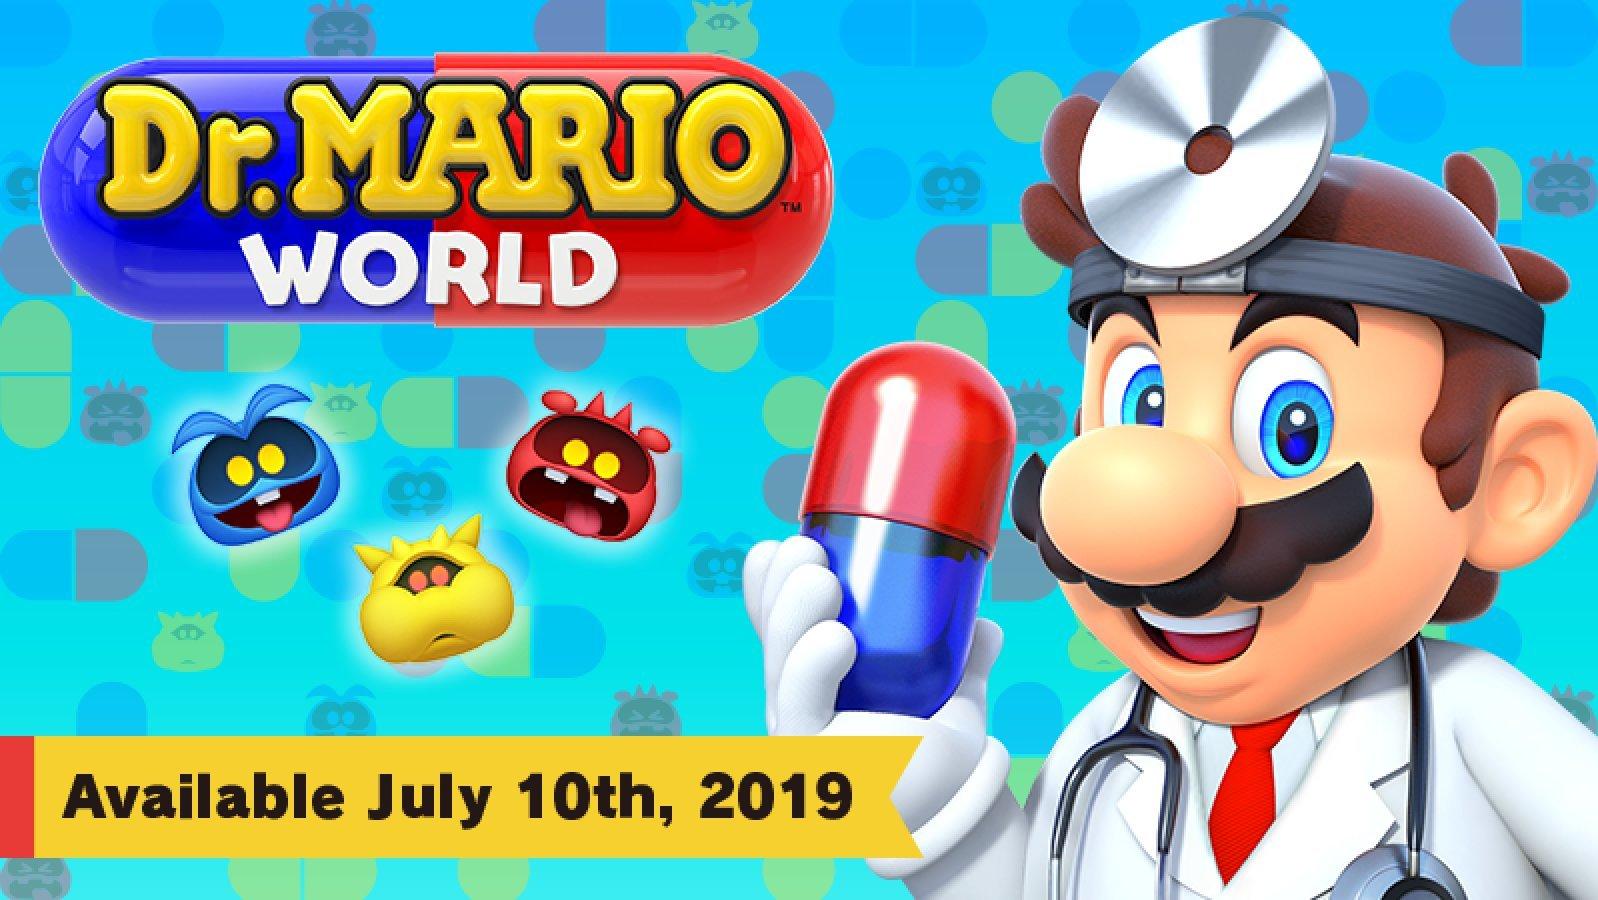 Dr. Mario World เปิดให้เล่นแล้ว! โหลดได้เลยทั้ง iOS และ Android